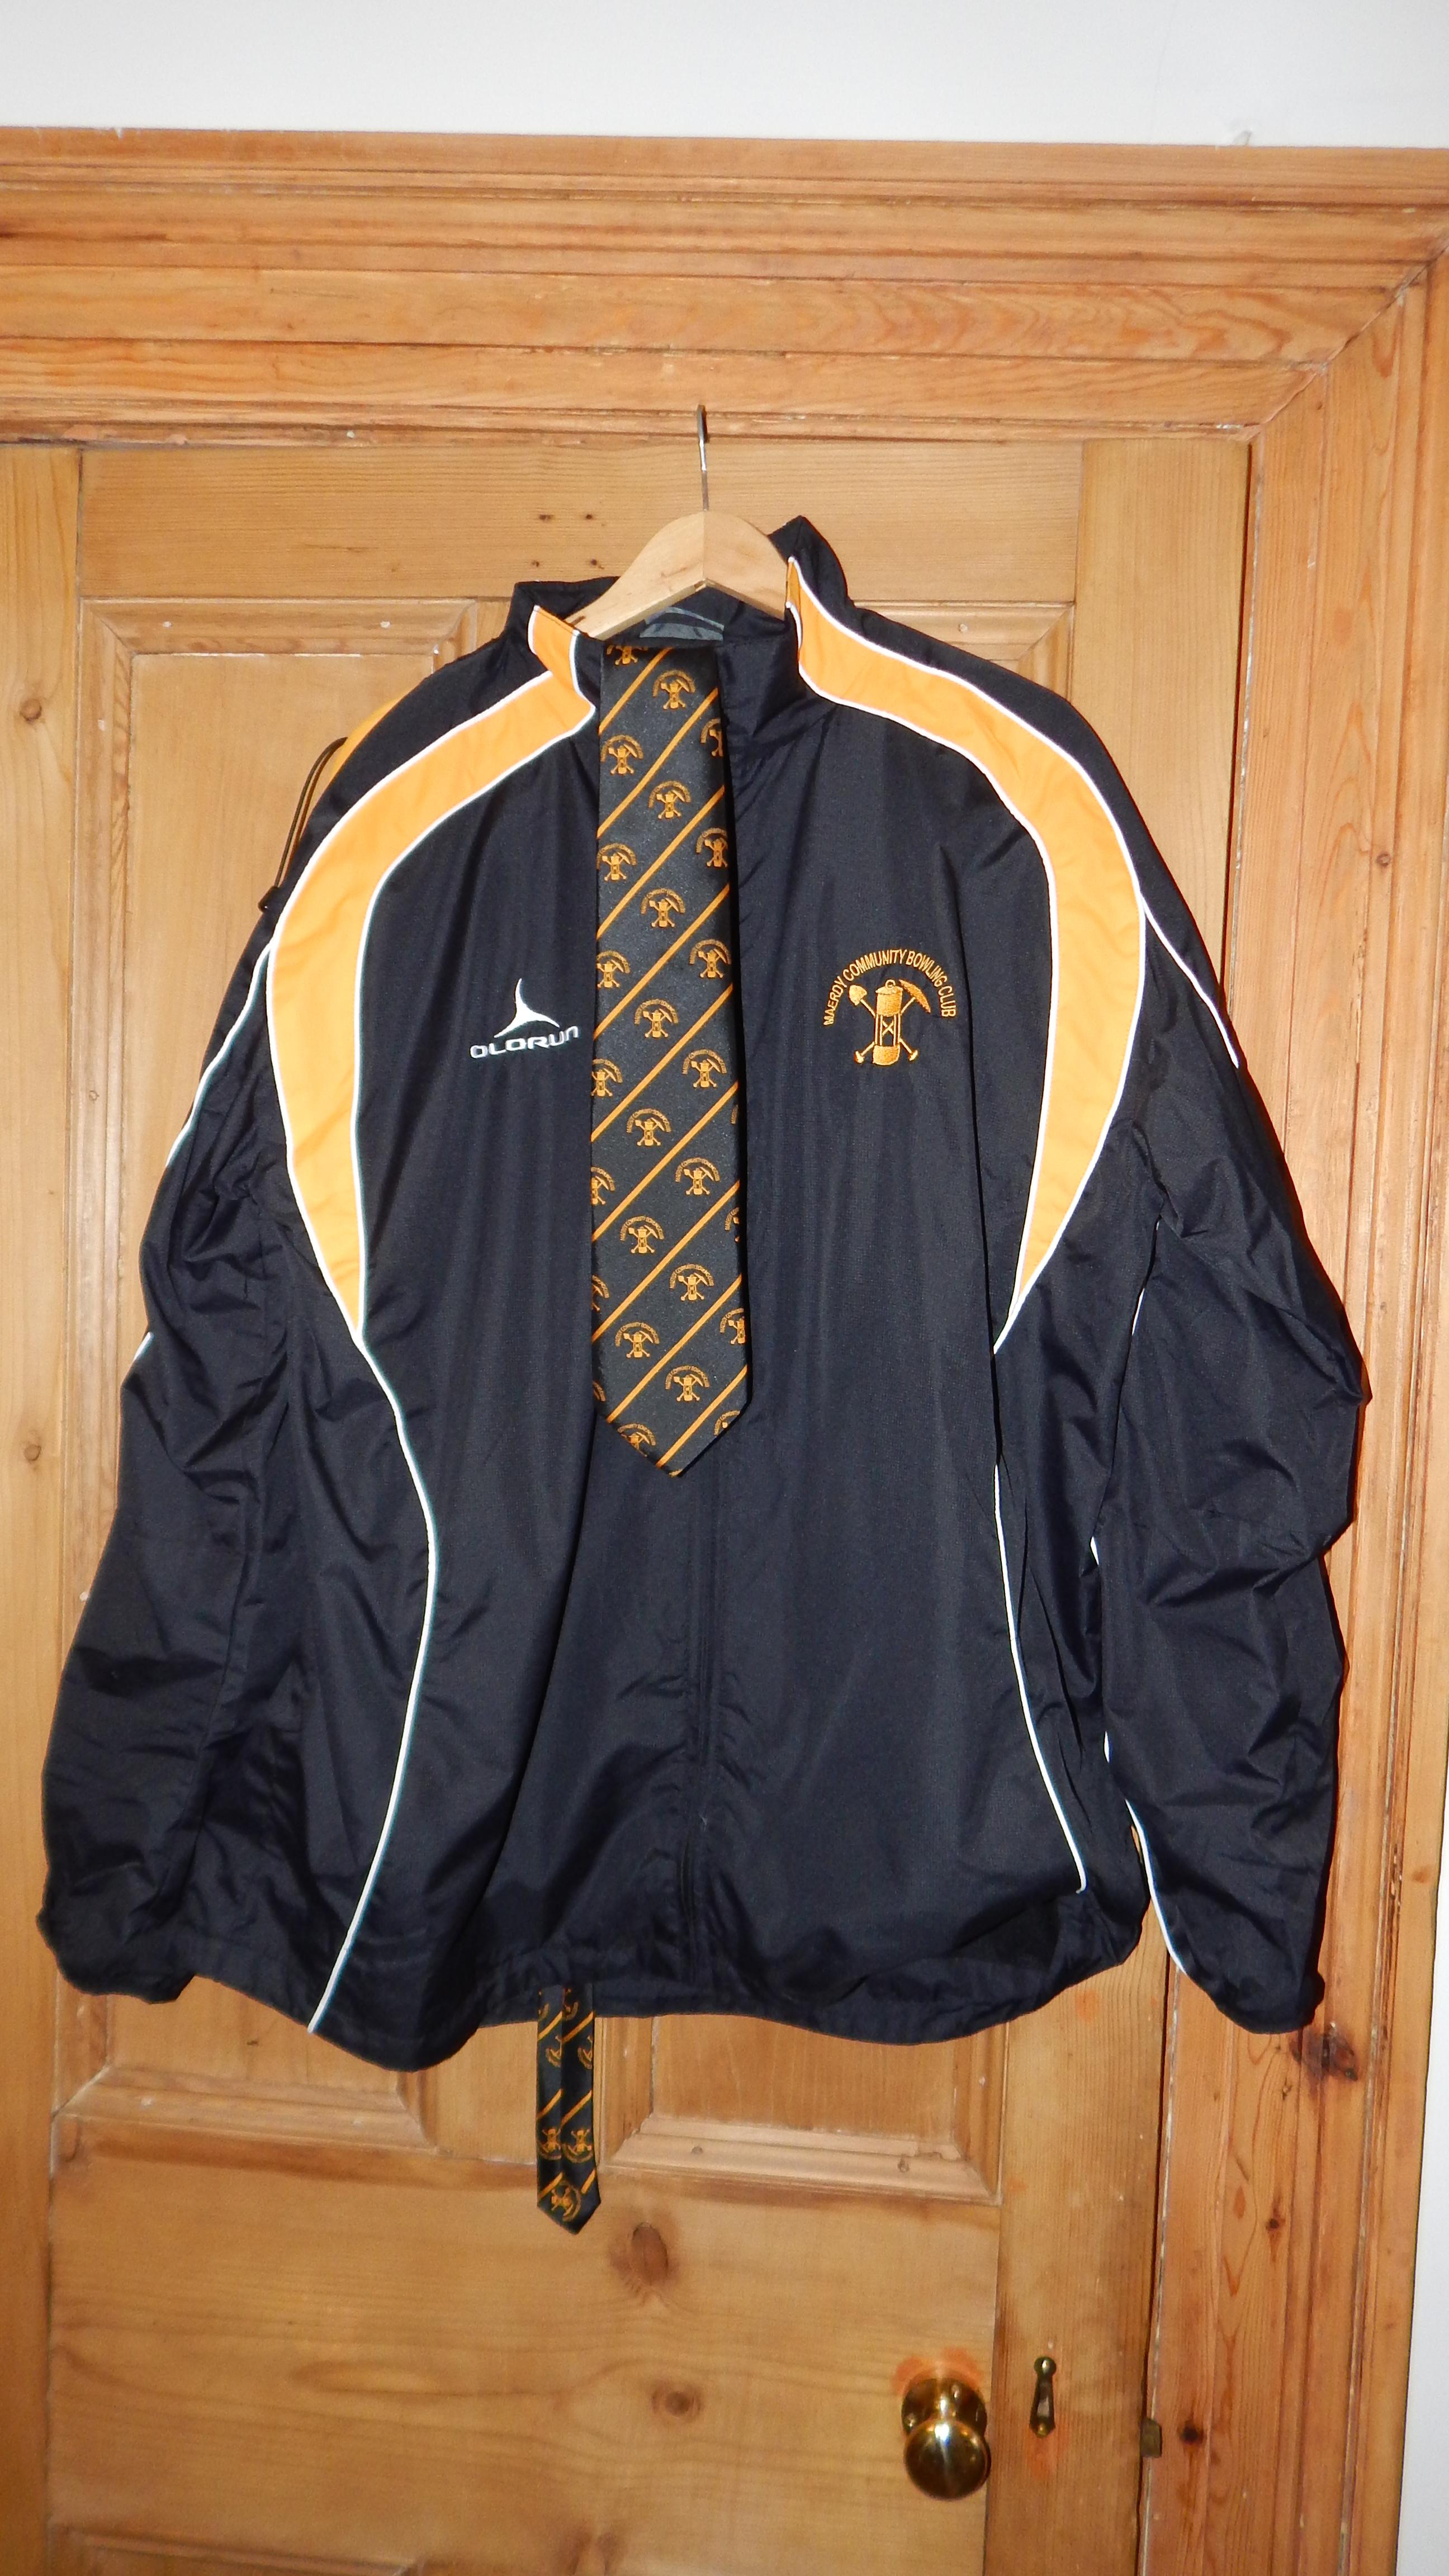 Bowling jacket & tie